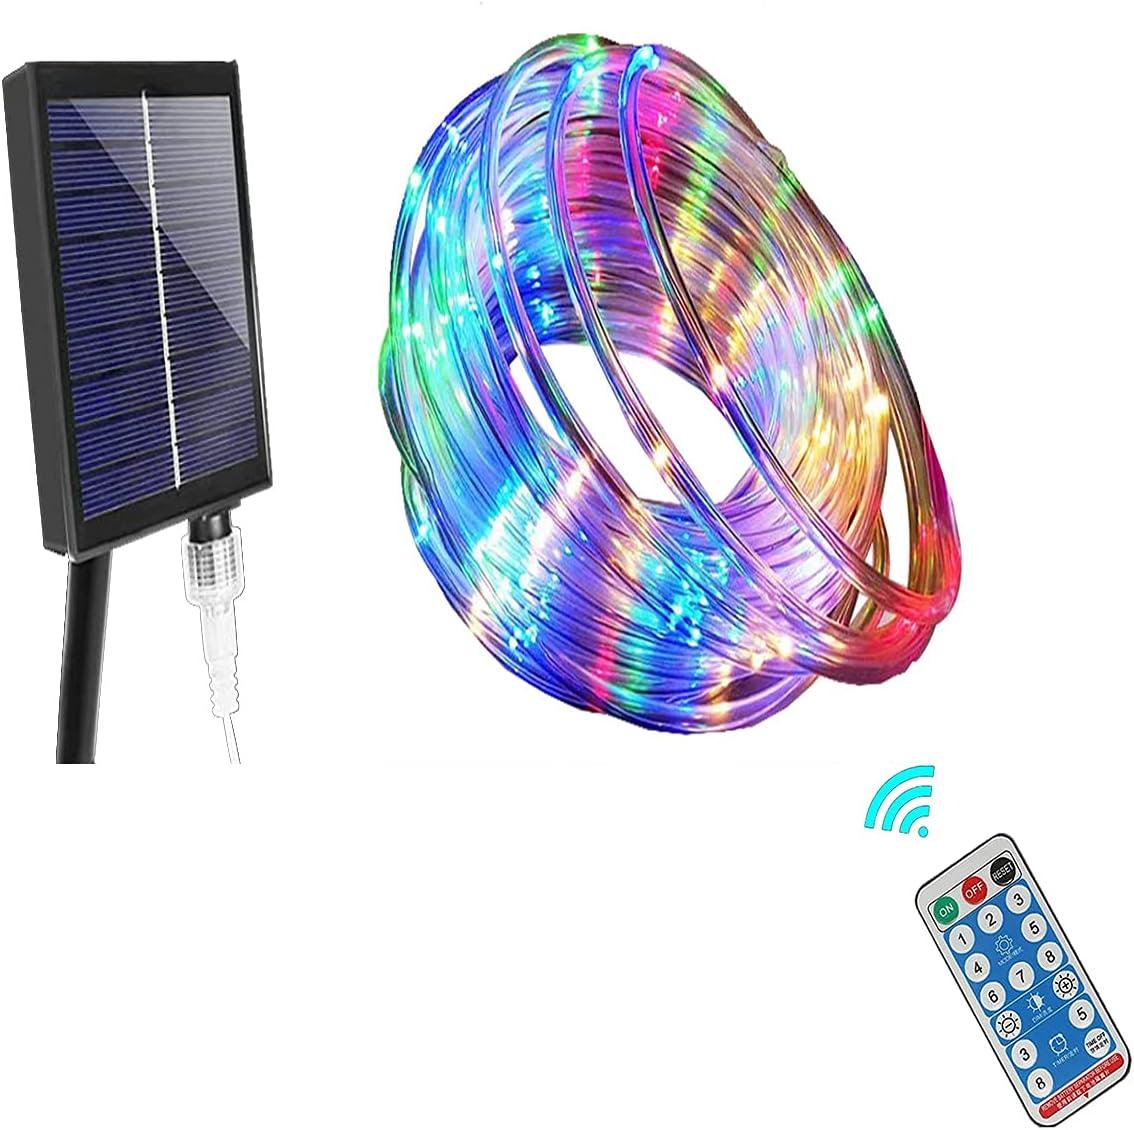 Waterproof 39.3Ft Trampoline LED Solar Powered Lights,Trampoline